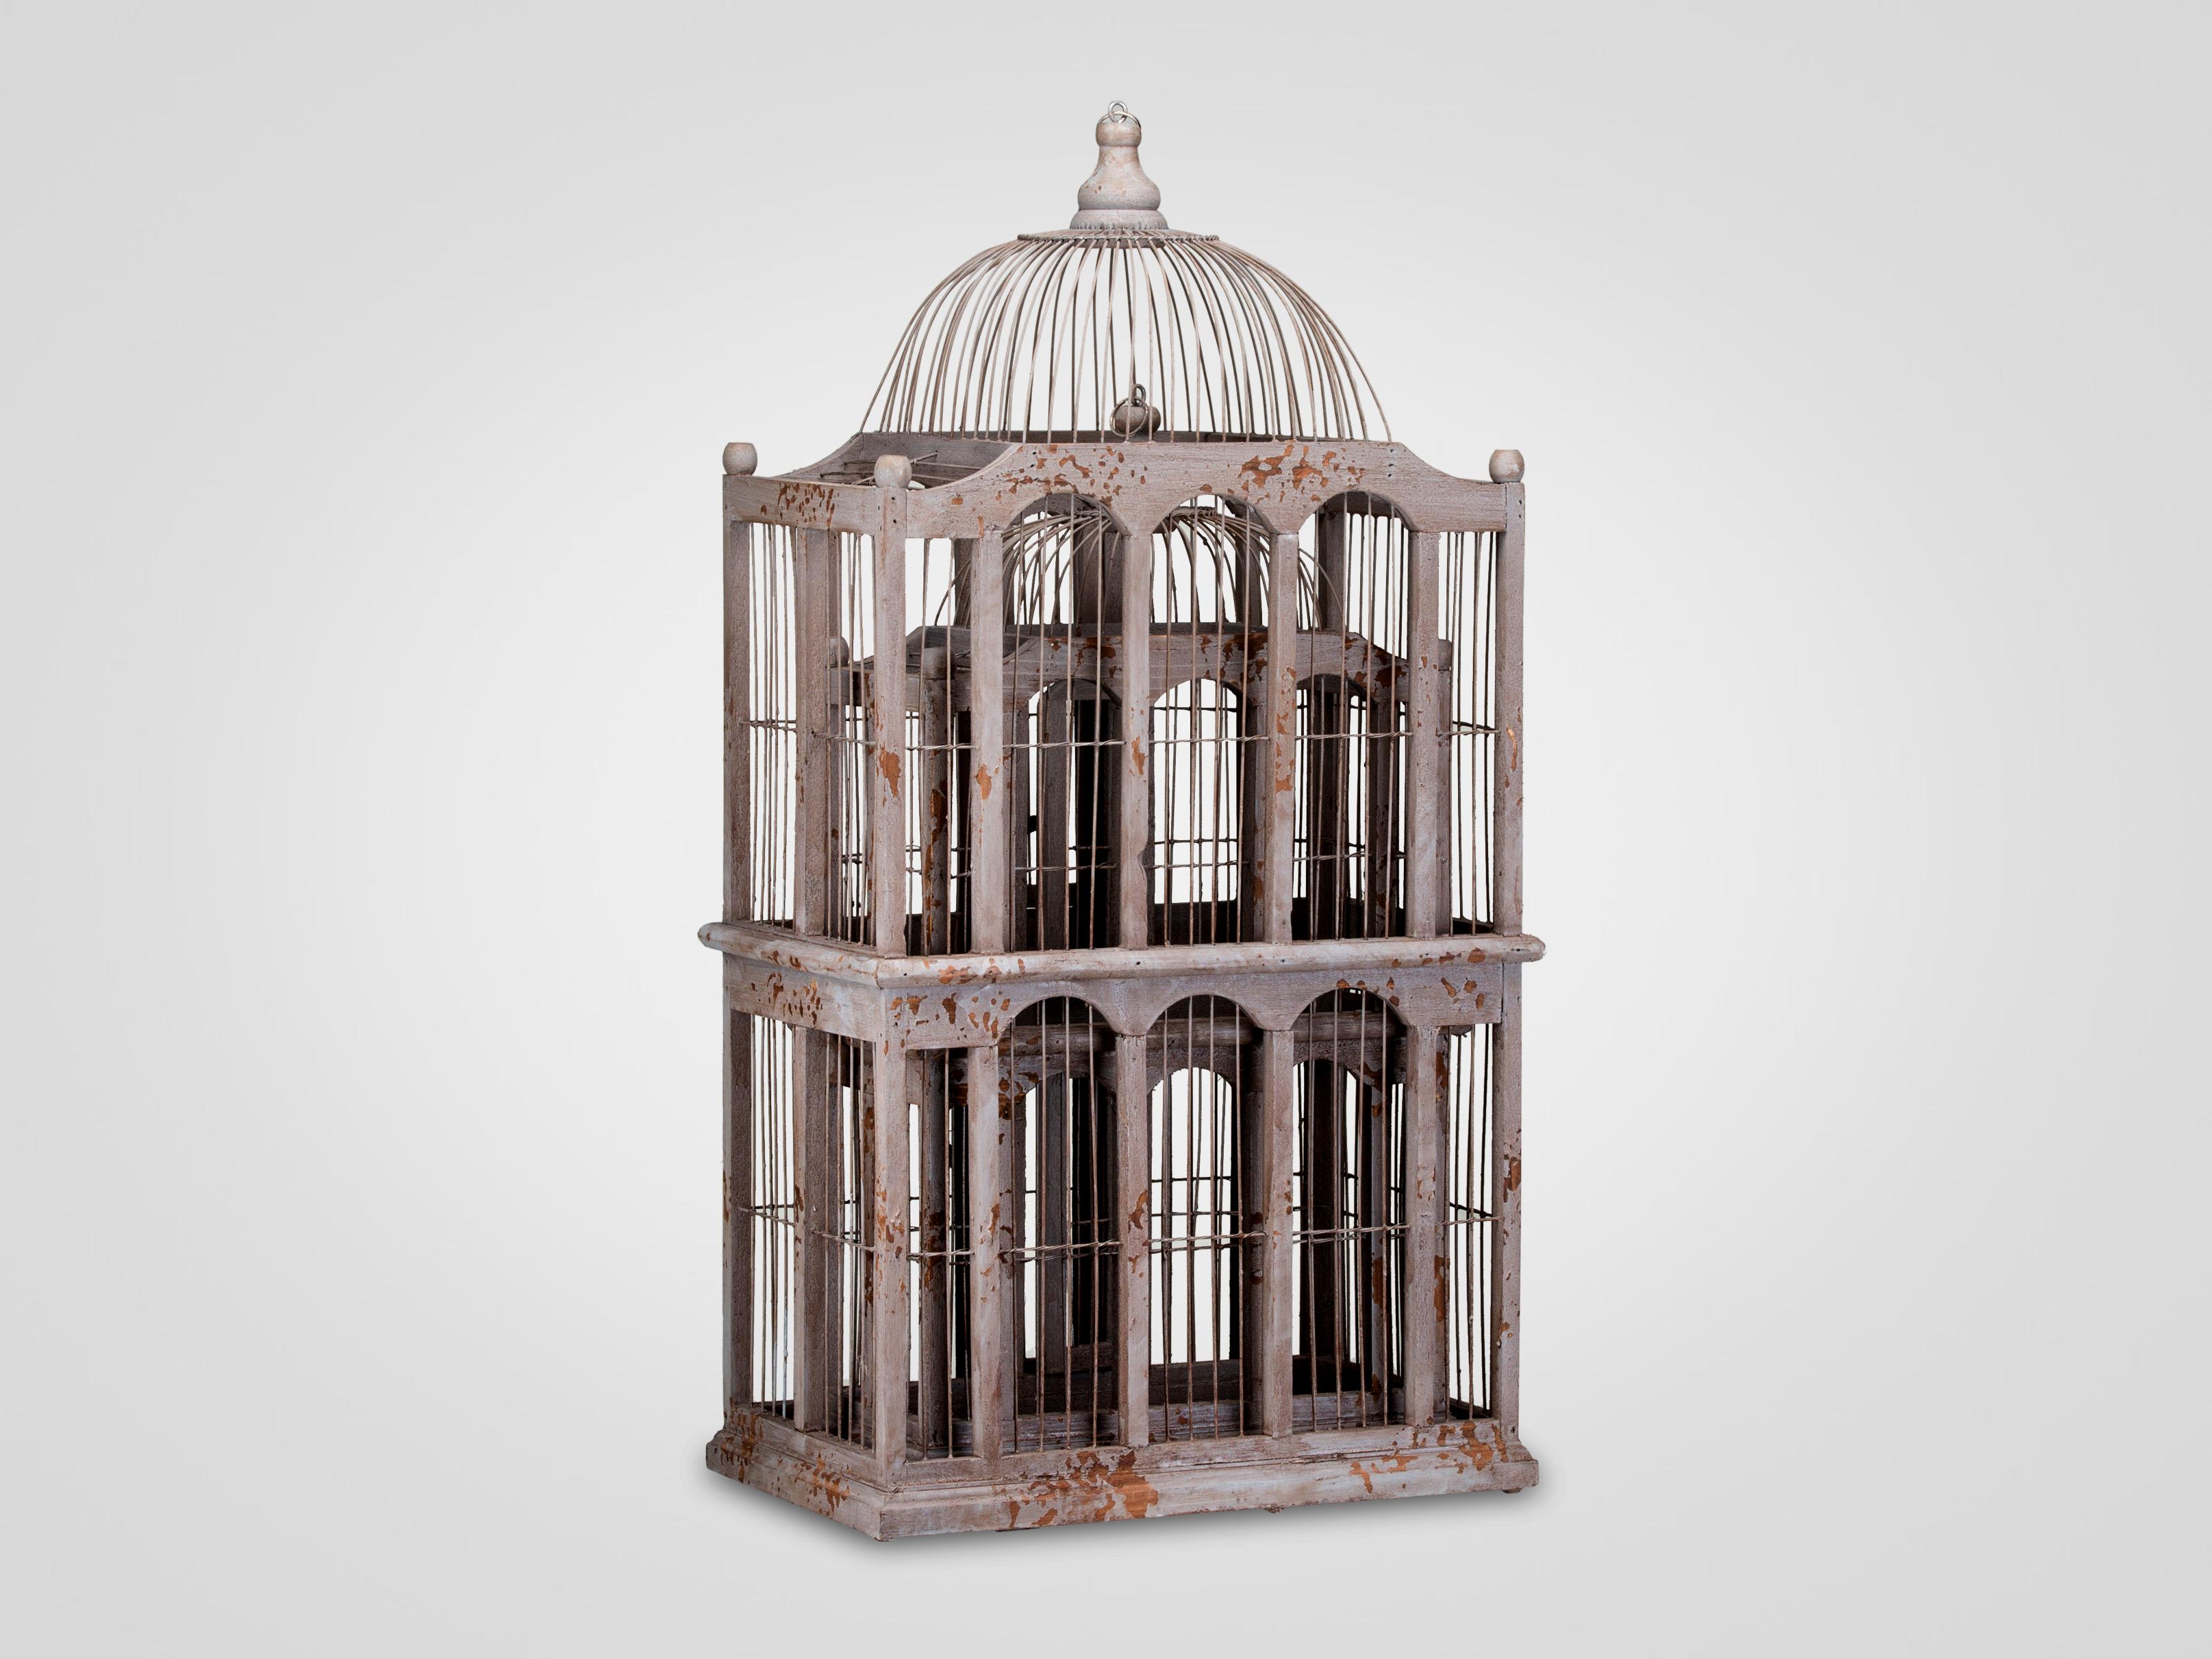 Комплект декоративных клеток (2шт) от The Furnish